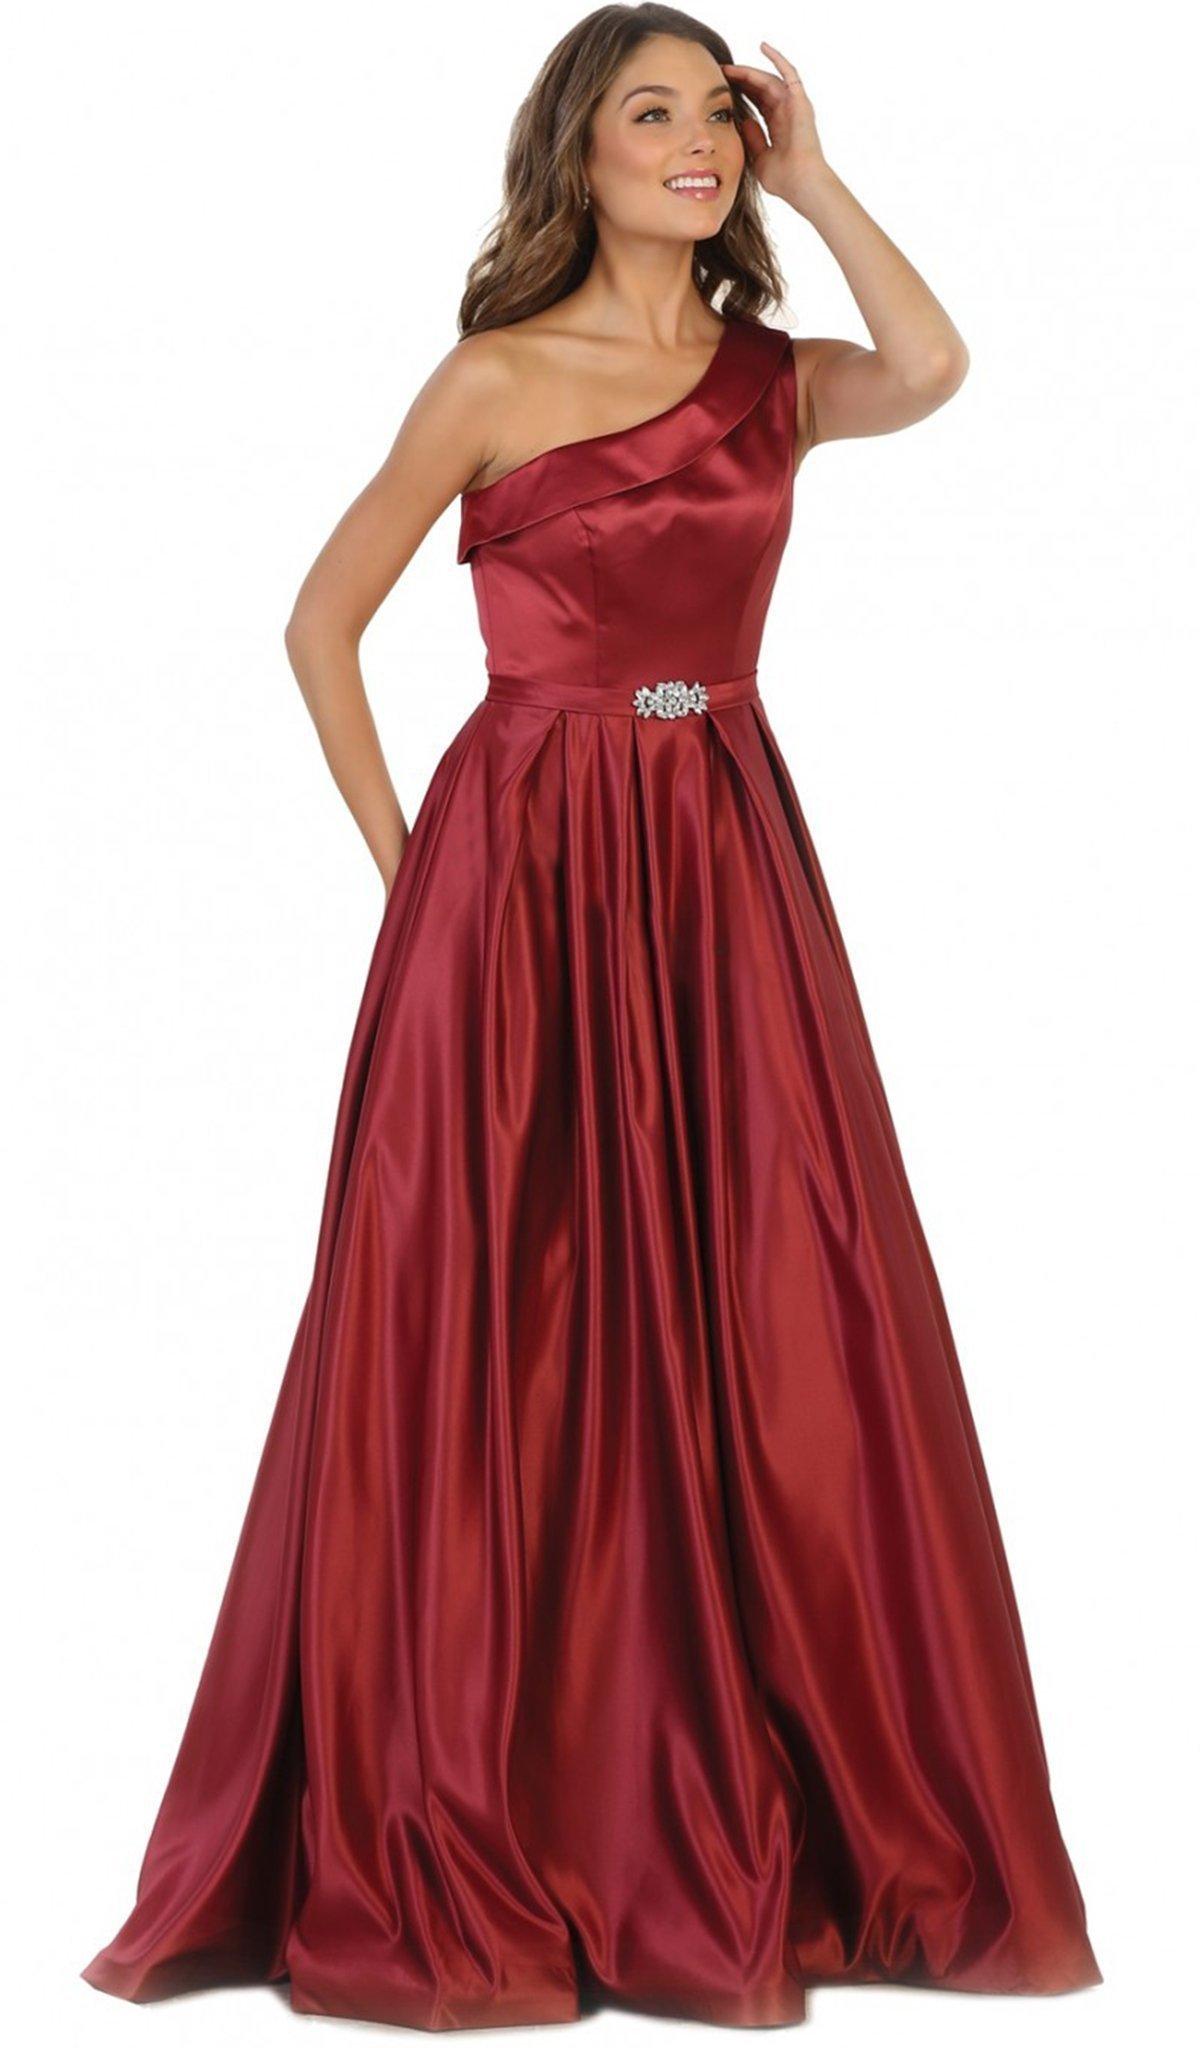 May Queen - Foldover Asymmetric A-line Evening Dress